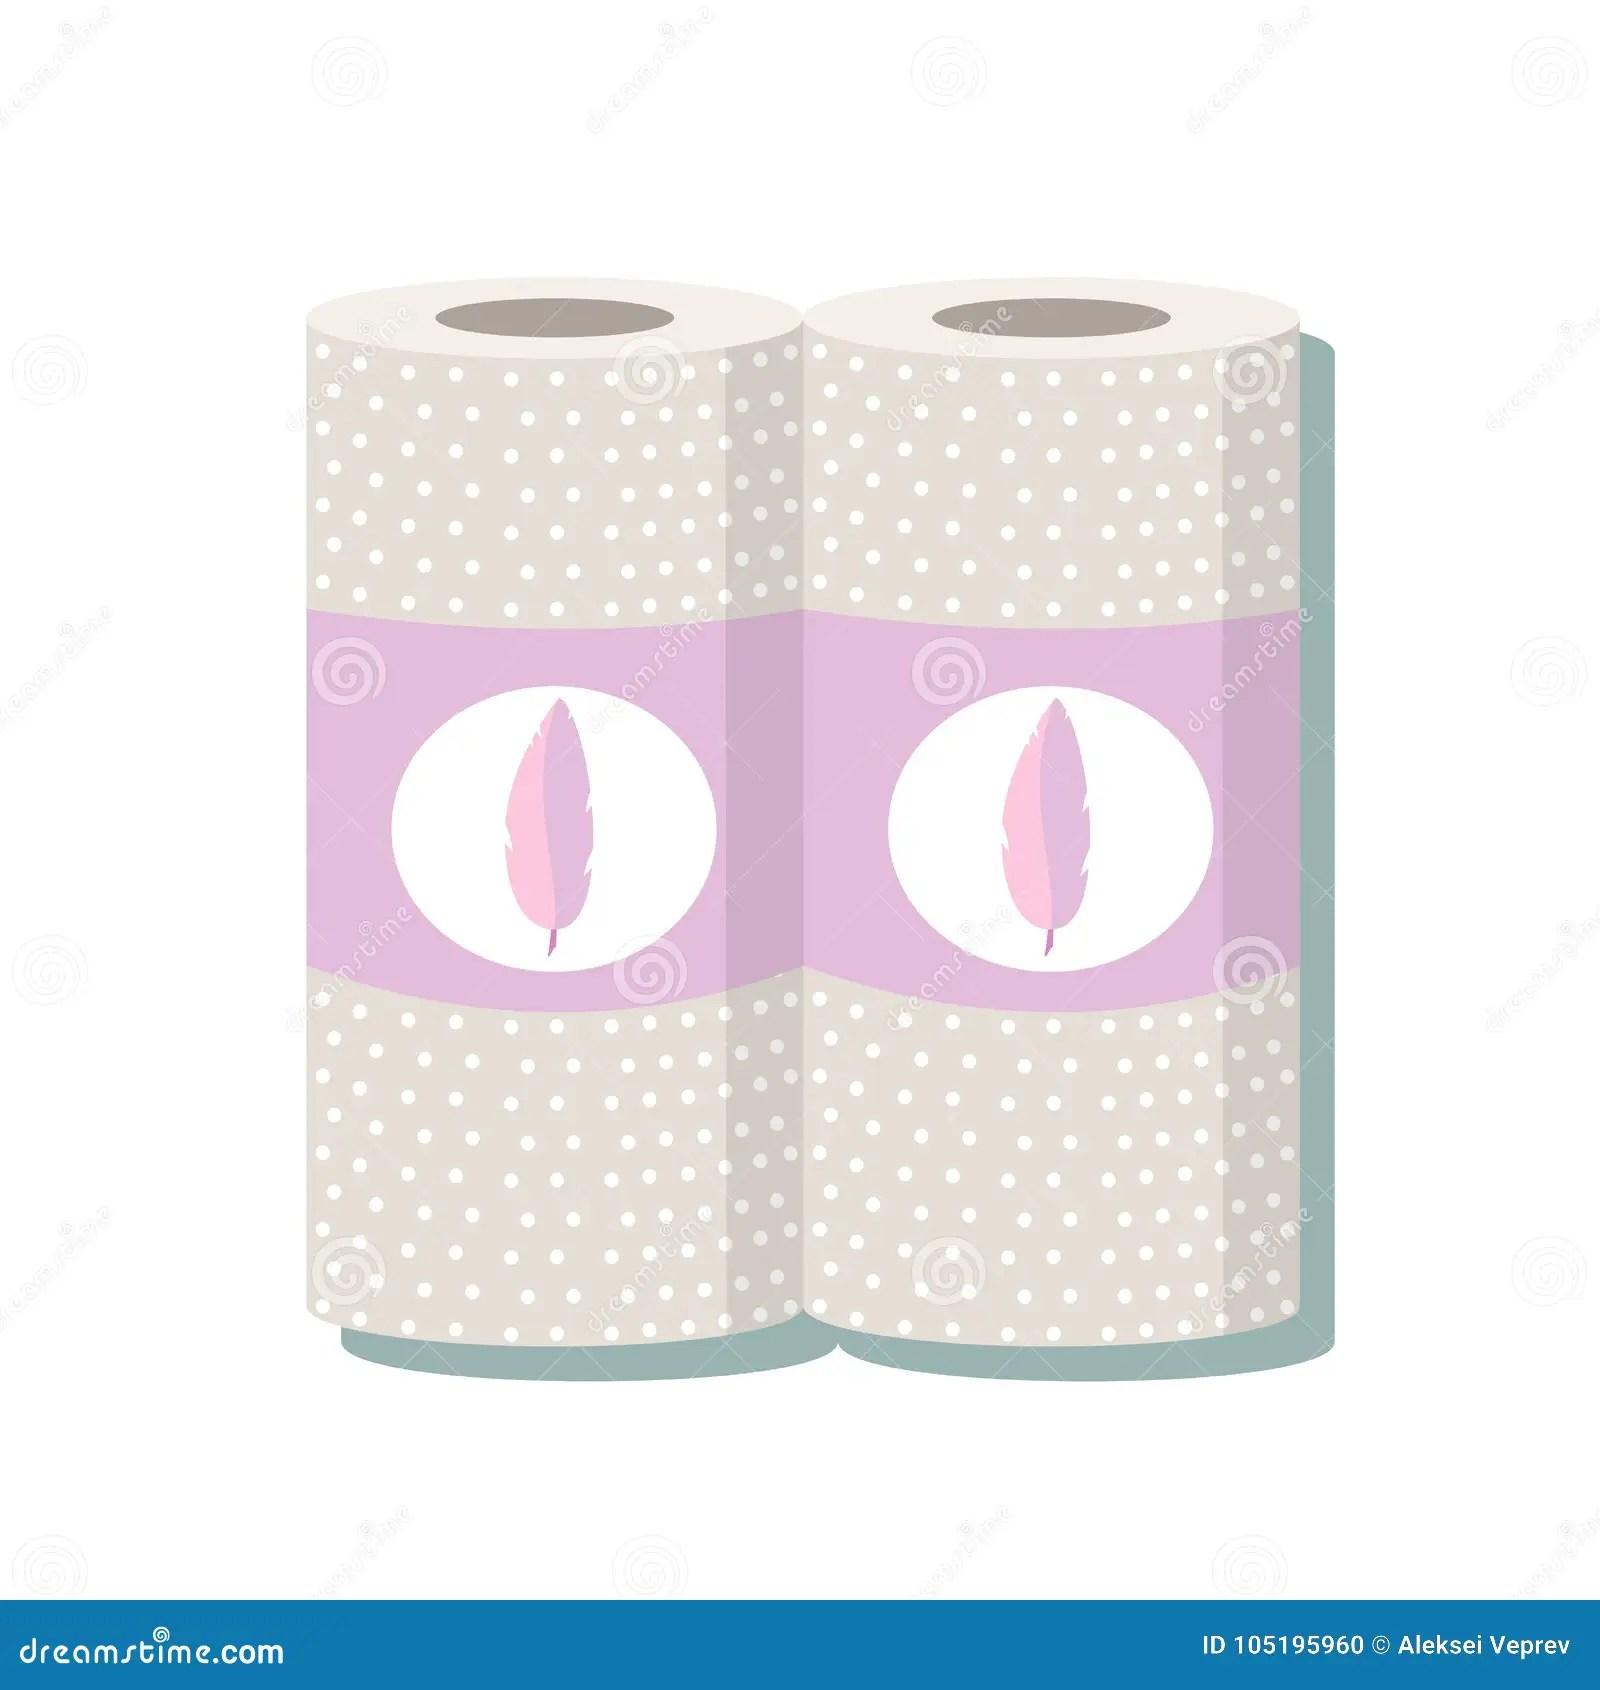 kitchen towels virtual design tool 传染媒介动画片厨房毛巾纸向量例证 插画包括有平面 擦净剂 程序包 可 传染媒介动画片厨房毛巾纸